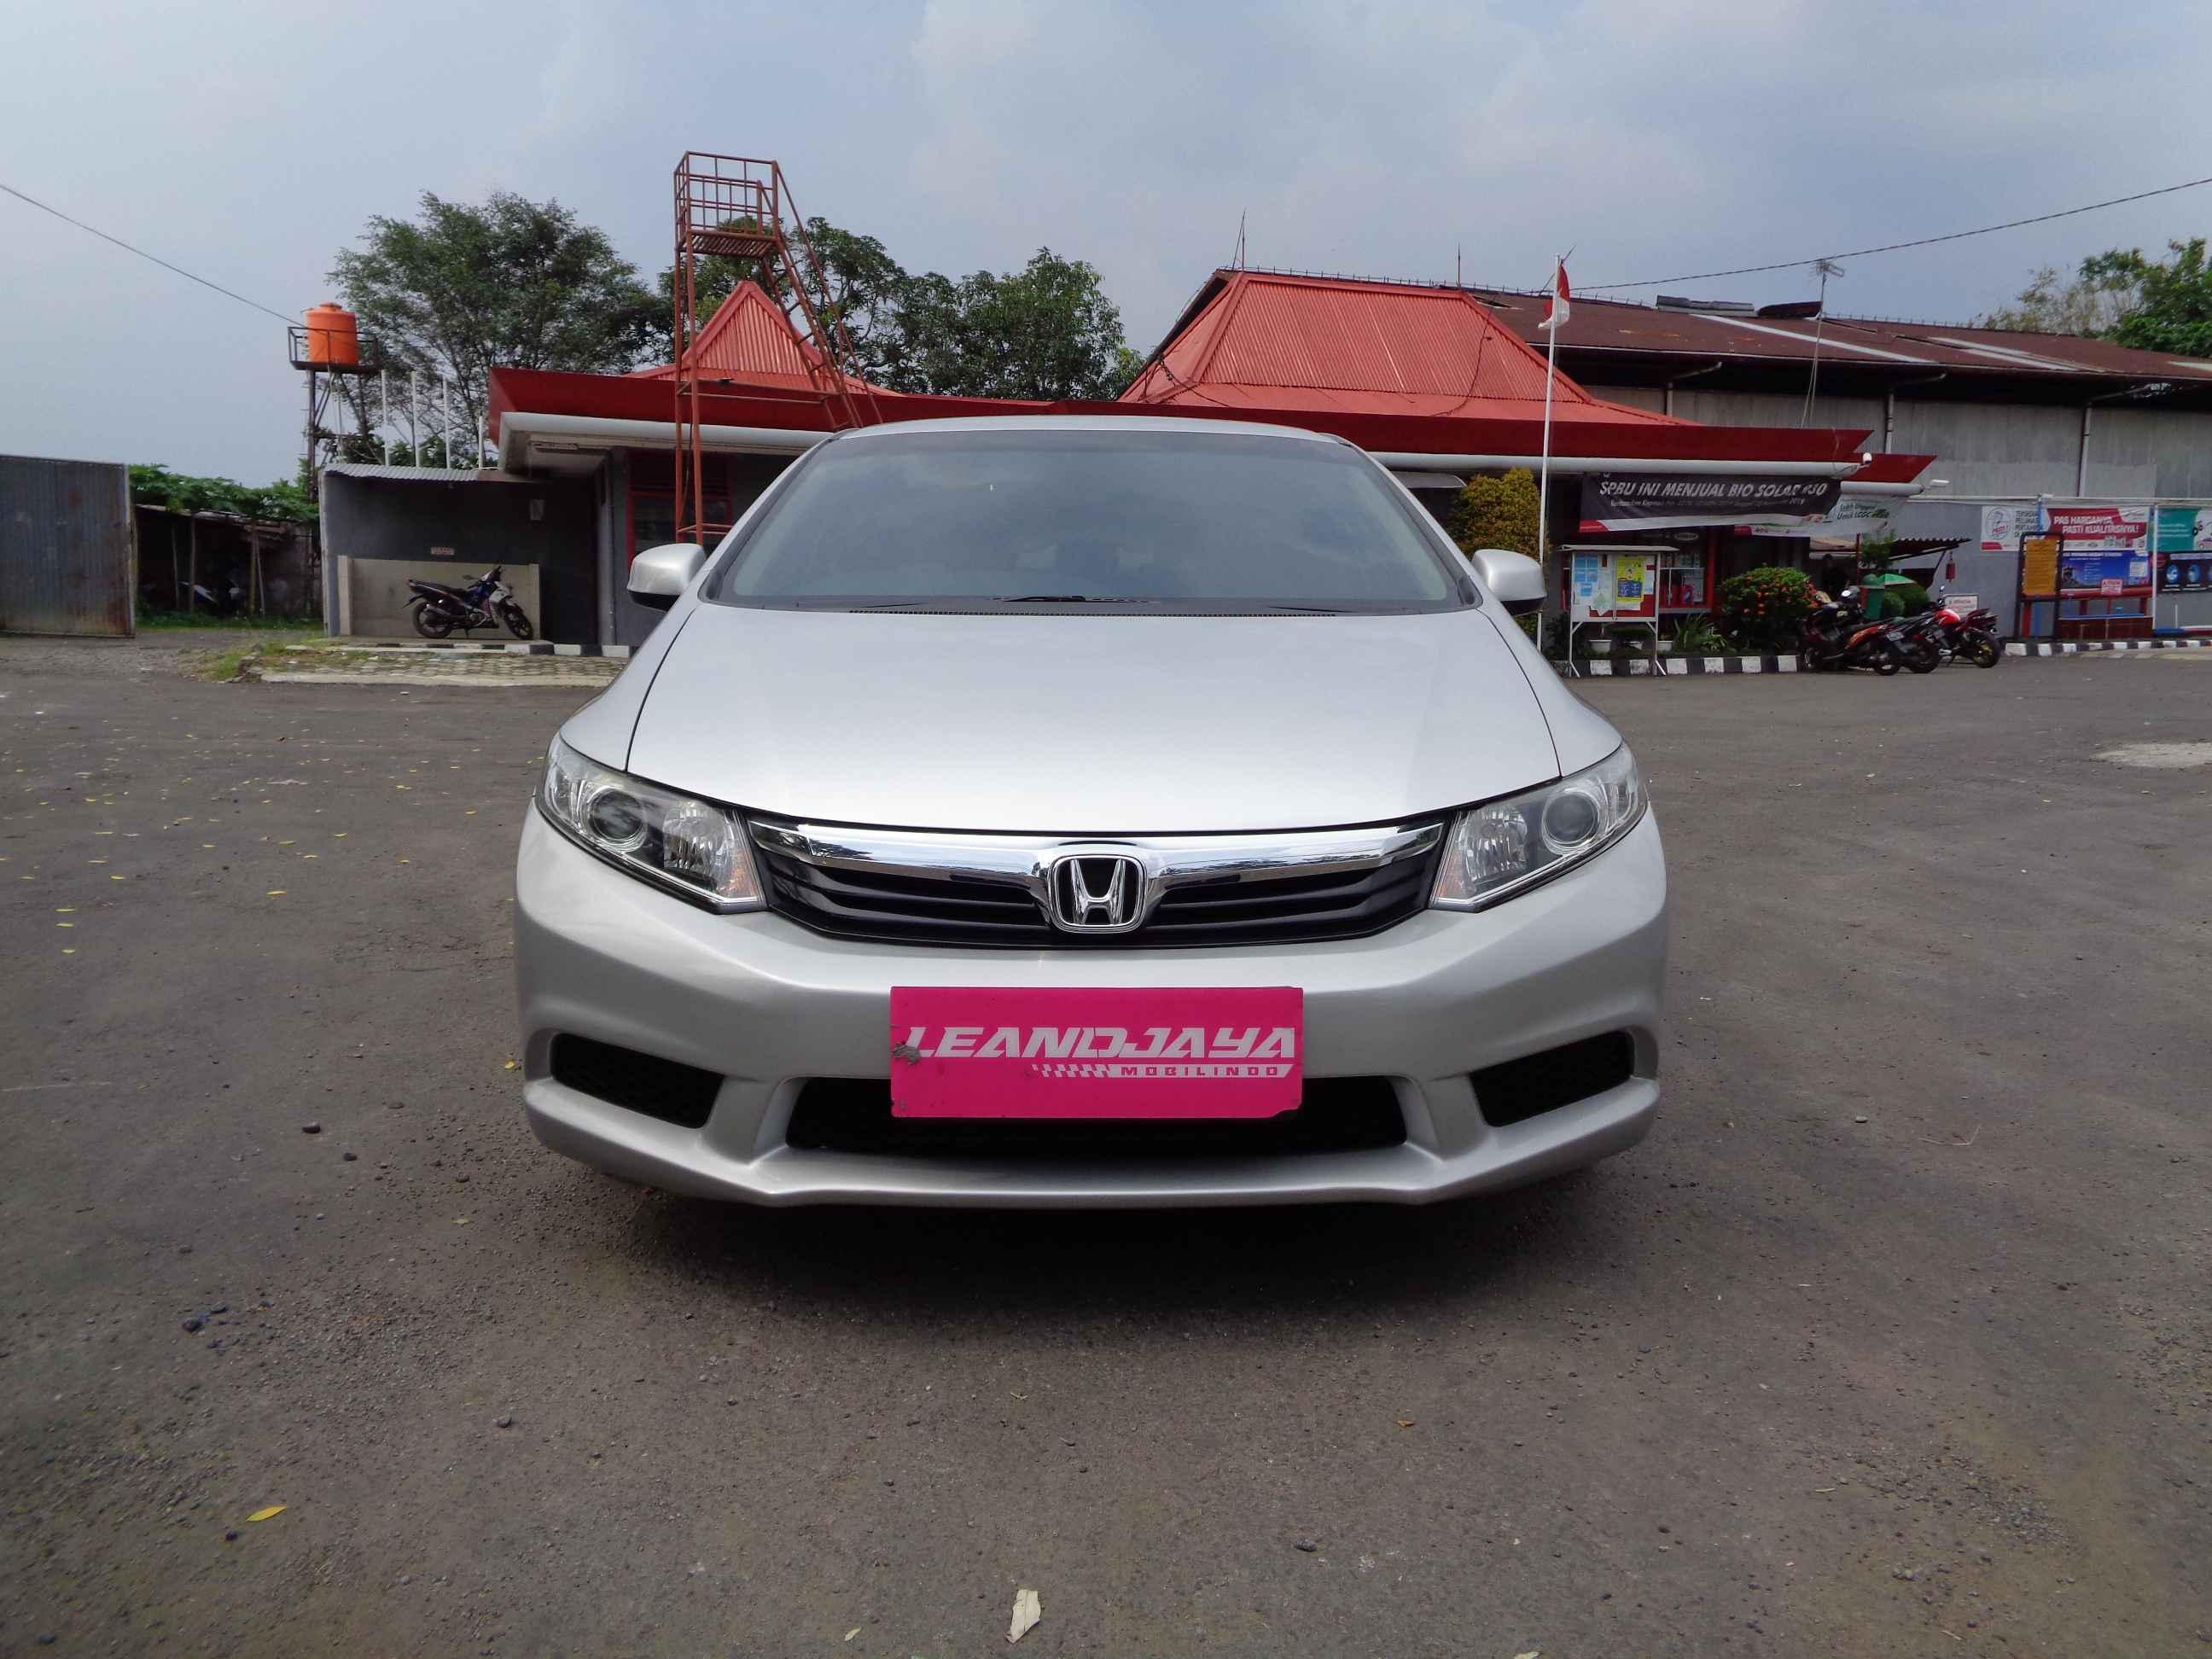 Kekurangan Harga Honda Civic Bekas Spesifikasi